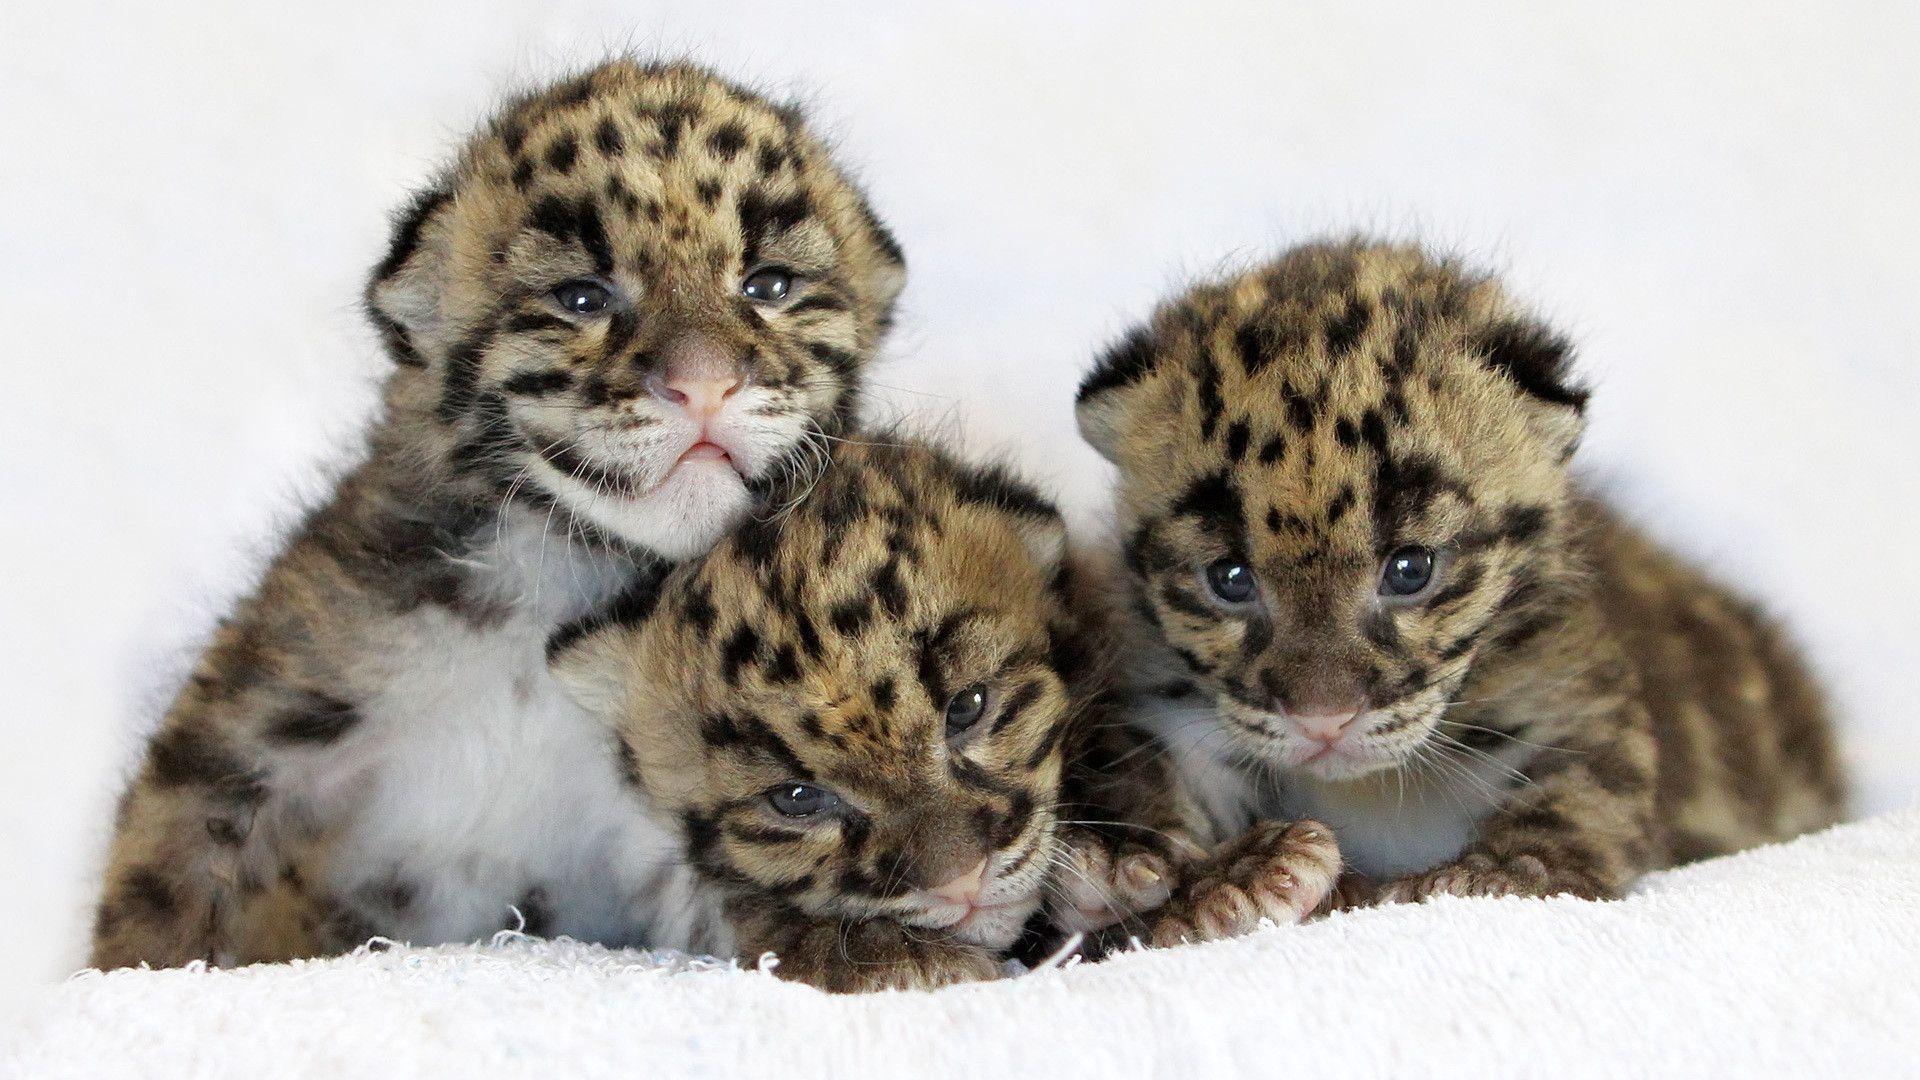 Cute Tiger Cubs Hd Wallpapers Cute Tiger Wallpapers Wallpaper Cave